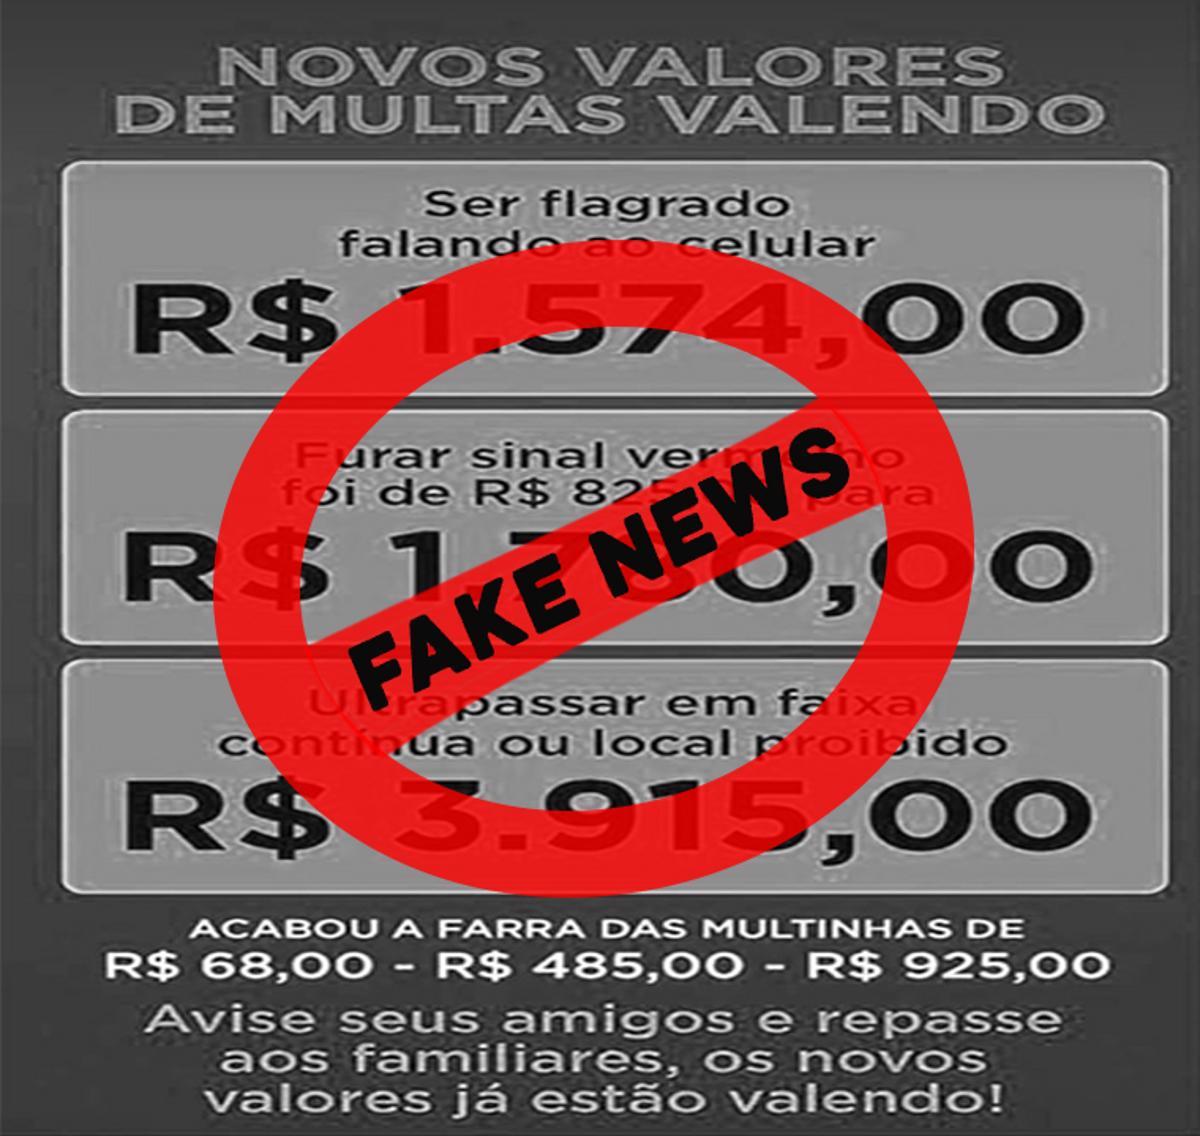 carimbo fake news multa